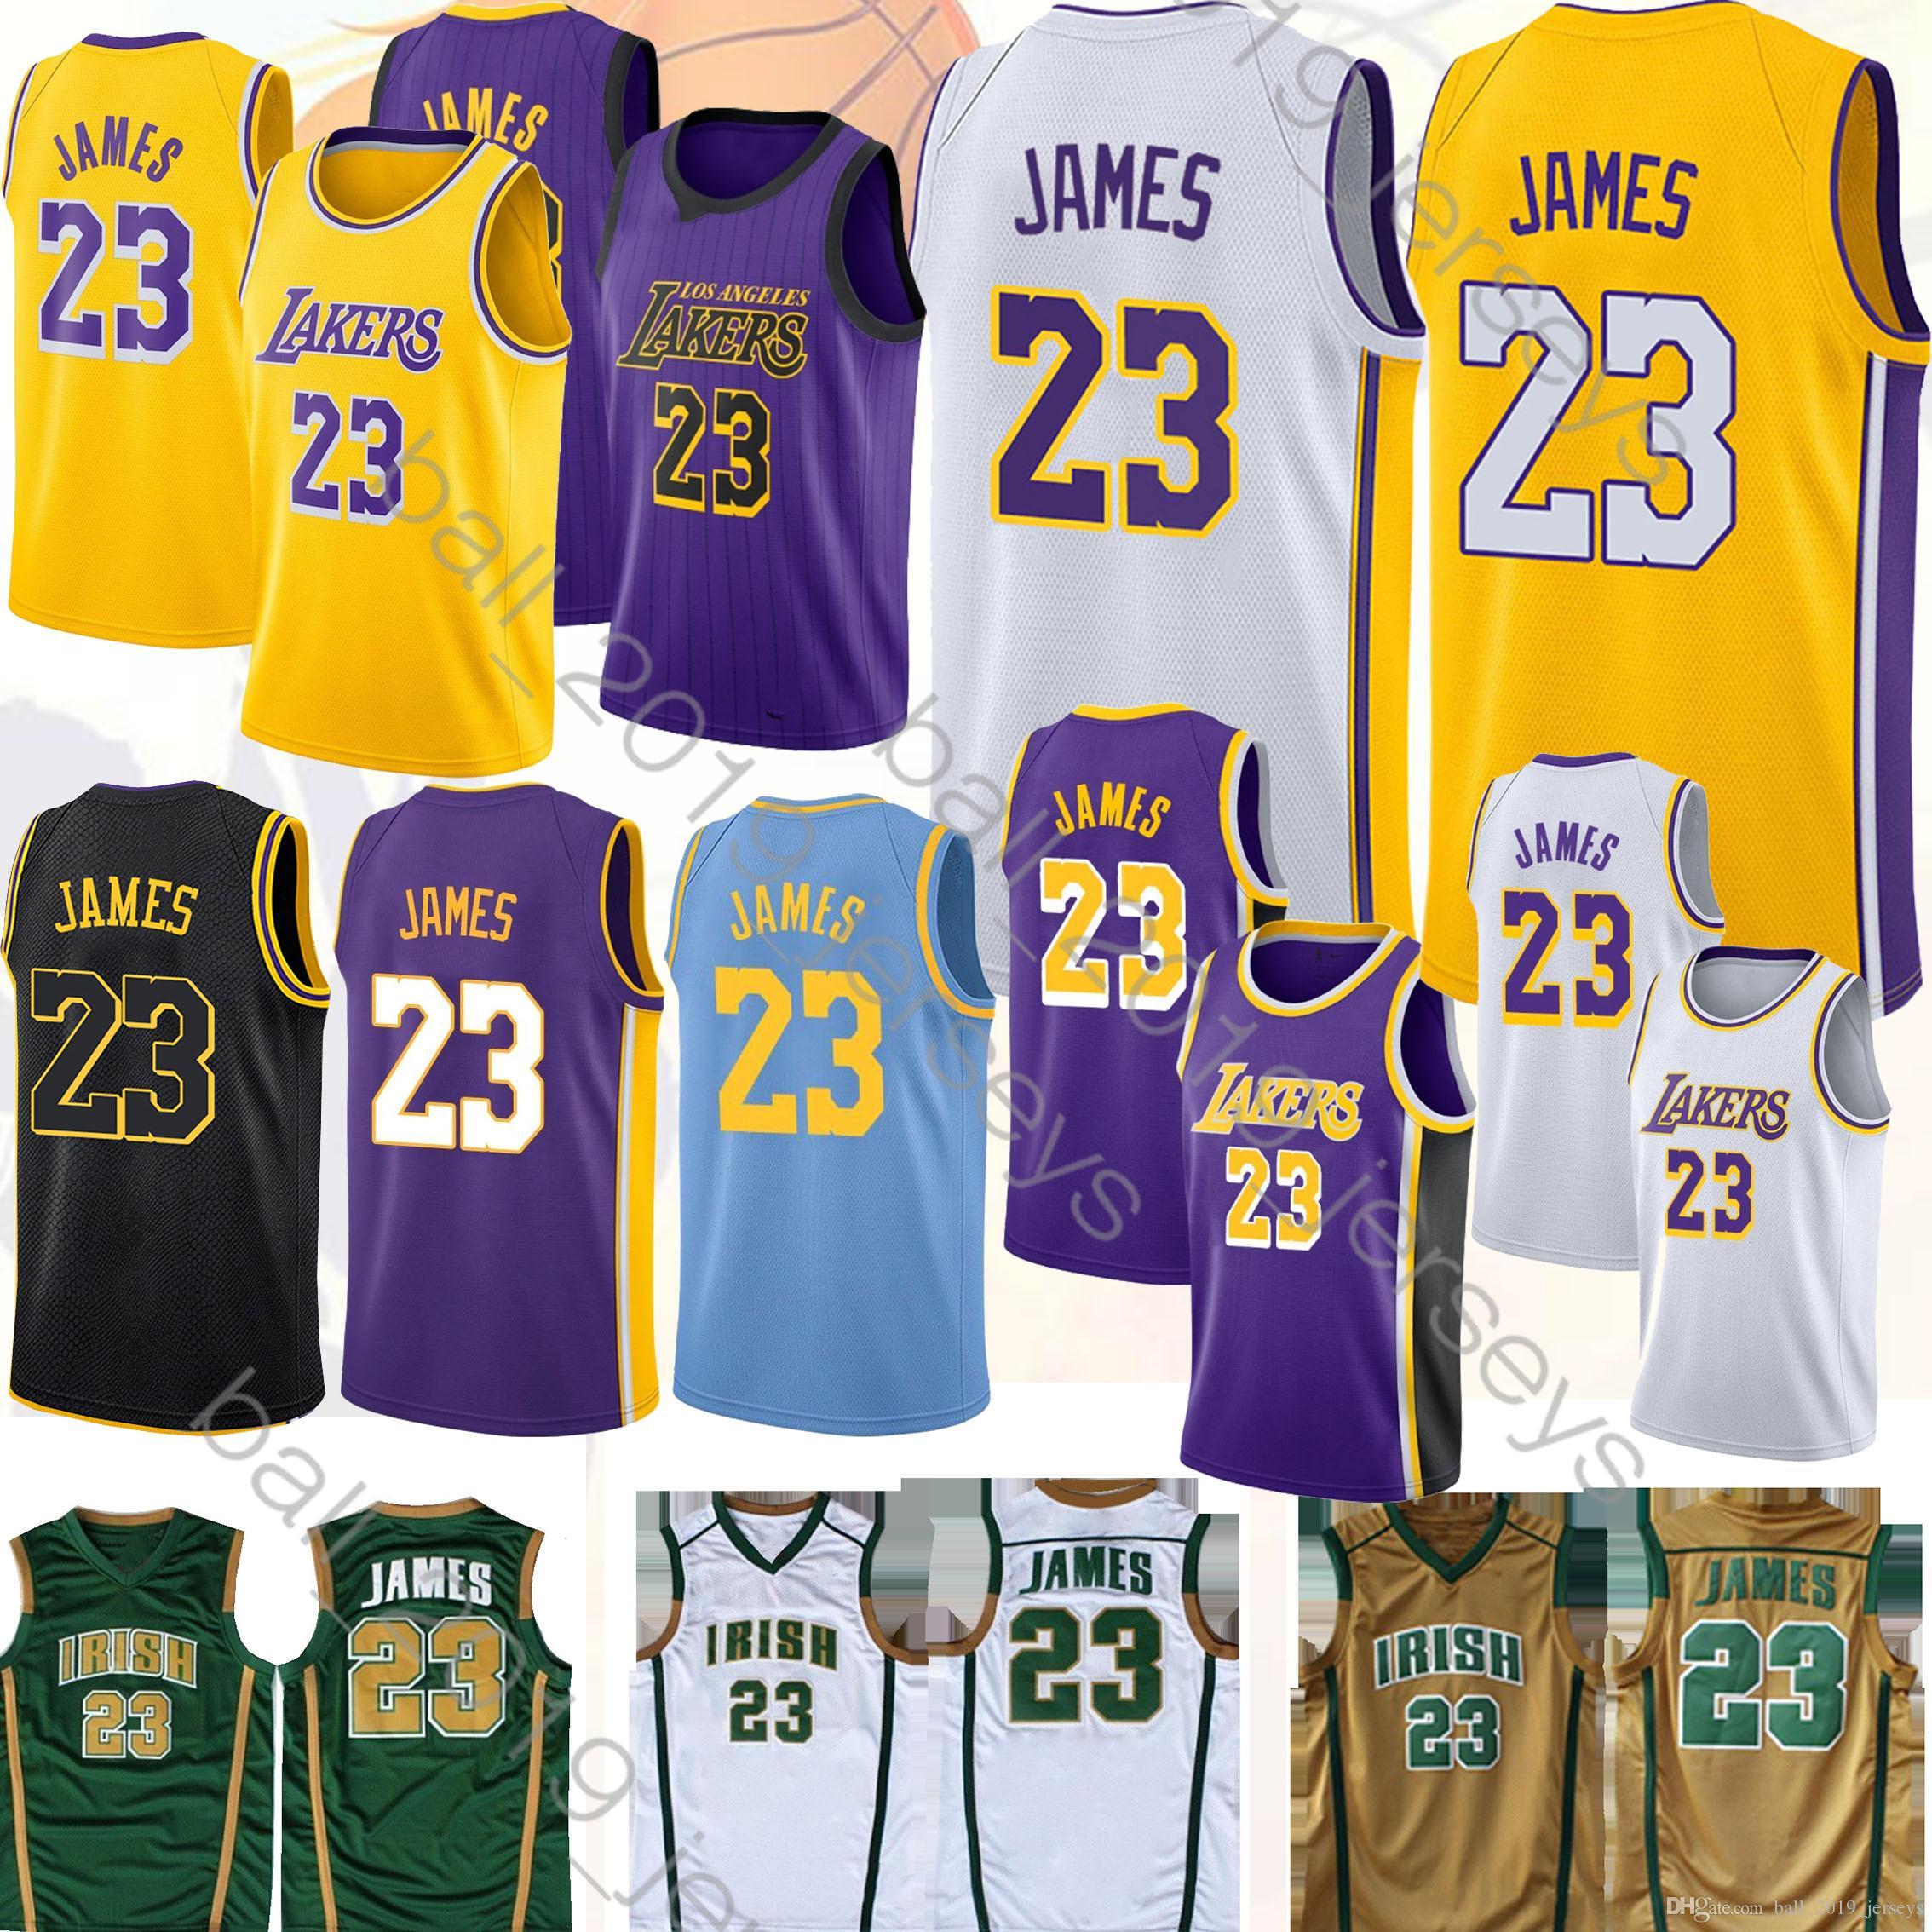 brand new 6ce94 b9fa6 23 LeBron James jersey Los Angele jersey Laker Hot sale Maillots de  basketball 2019 men basketball jerseys